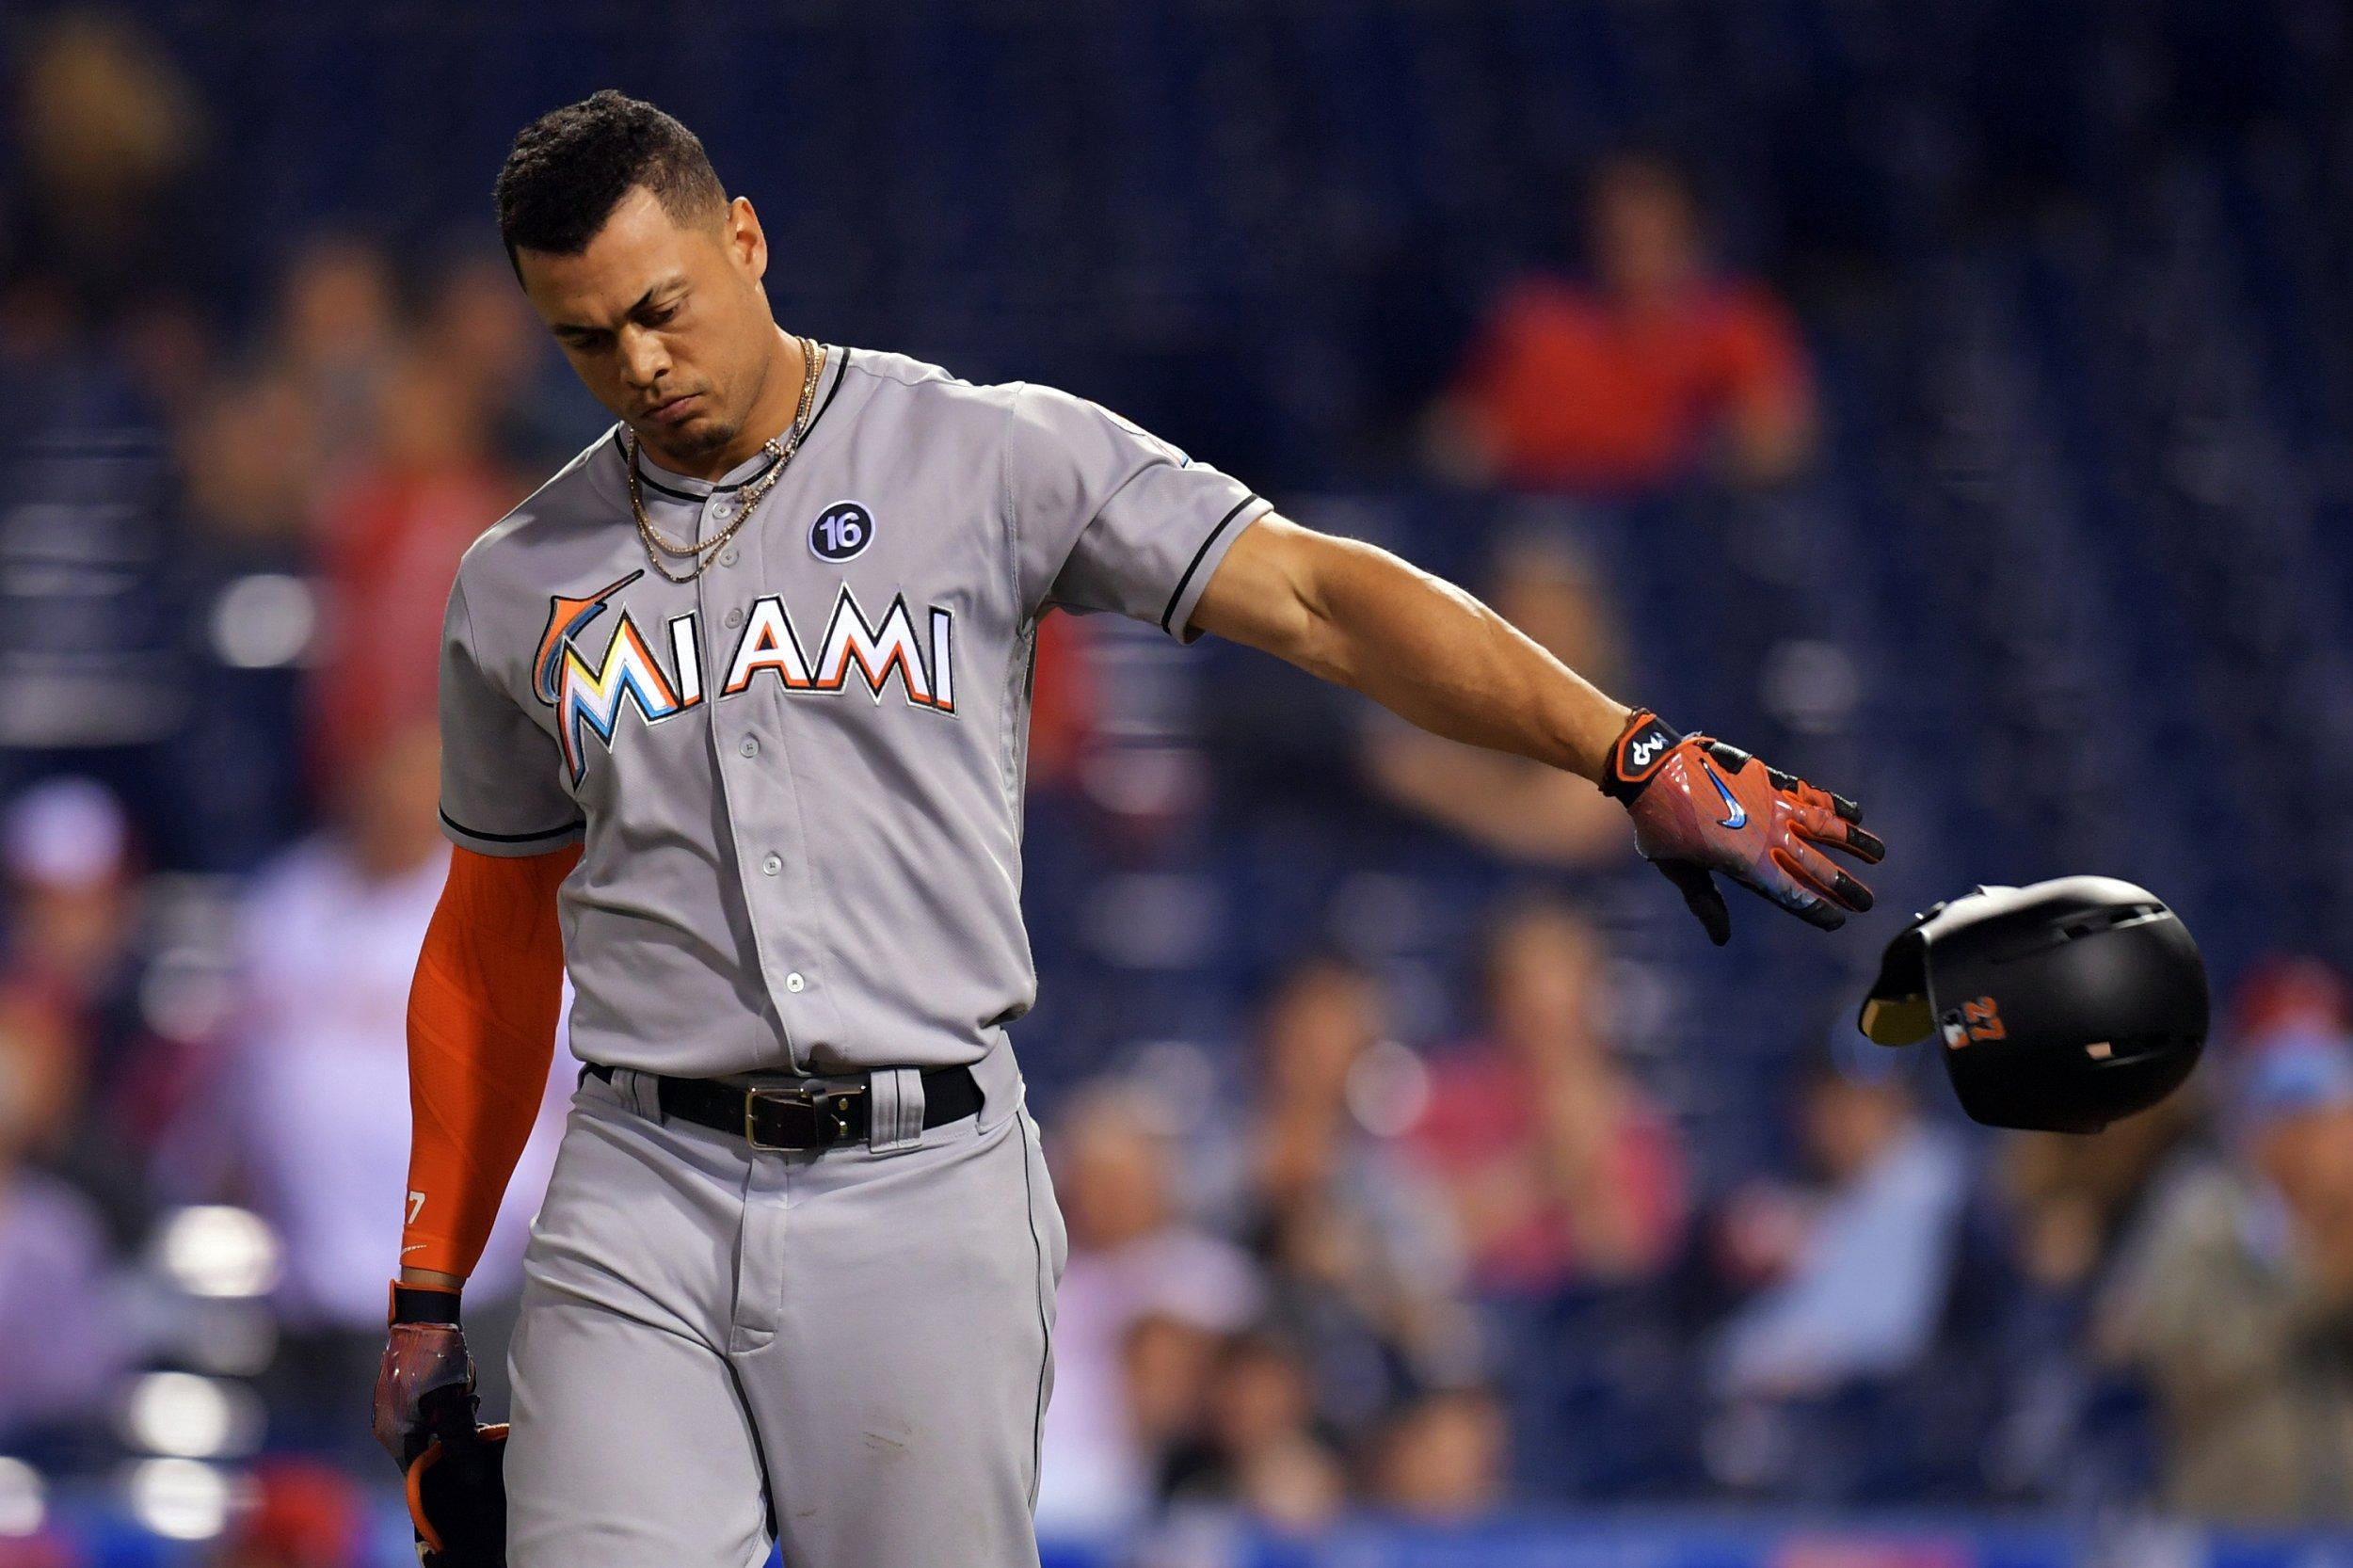 Miami marlins outfielder giancarlo stanton.